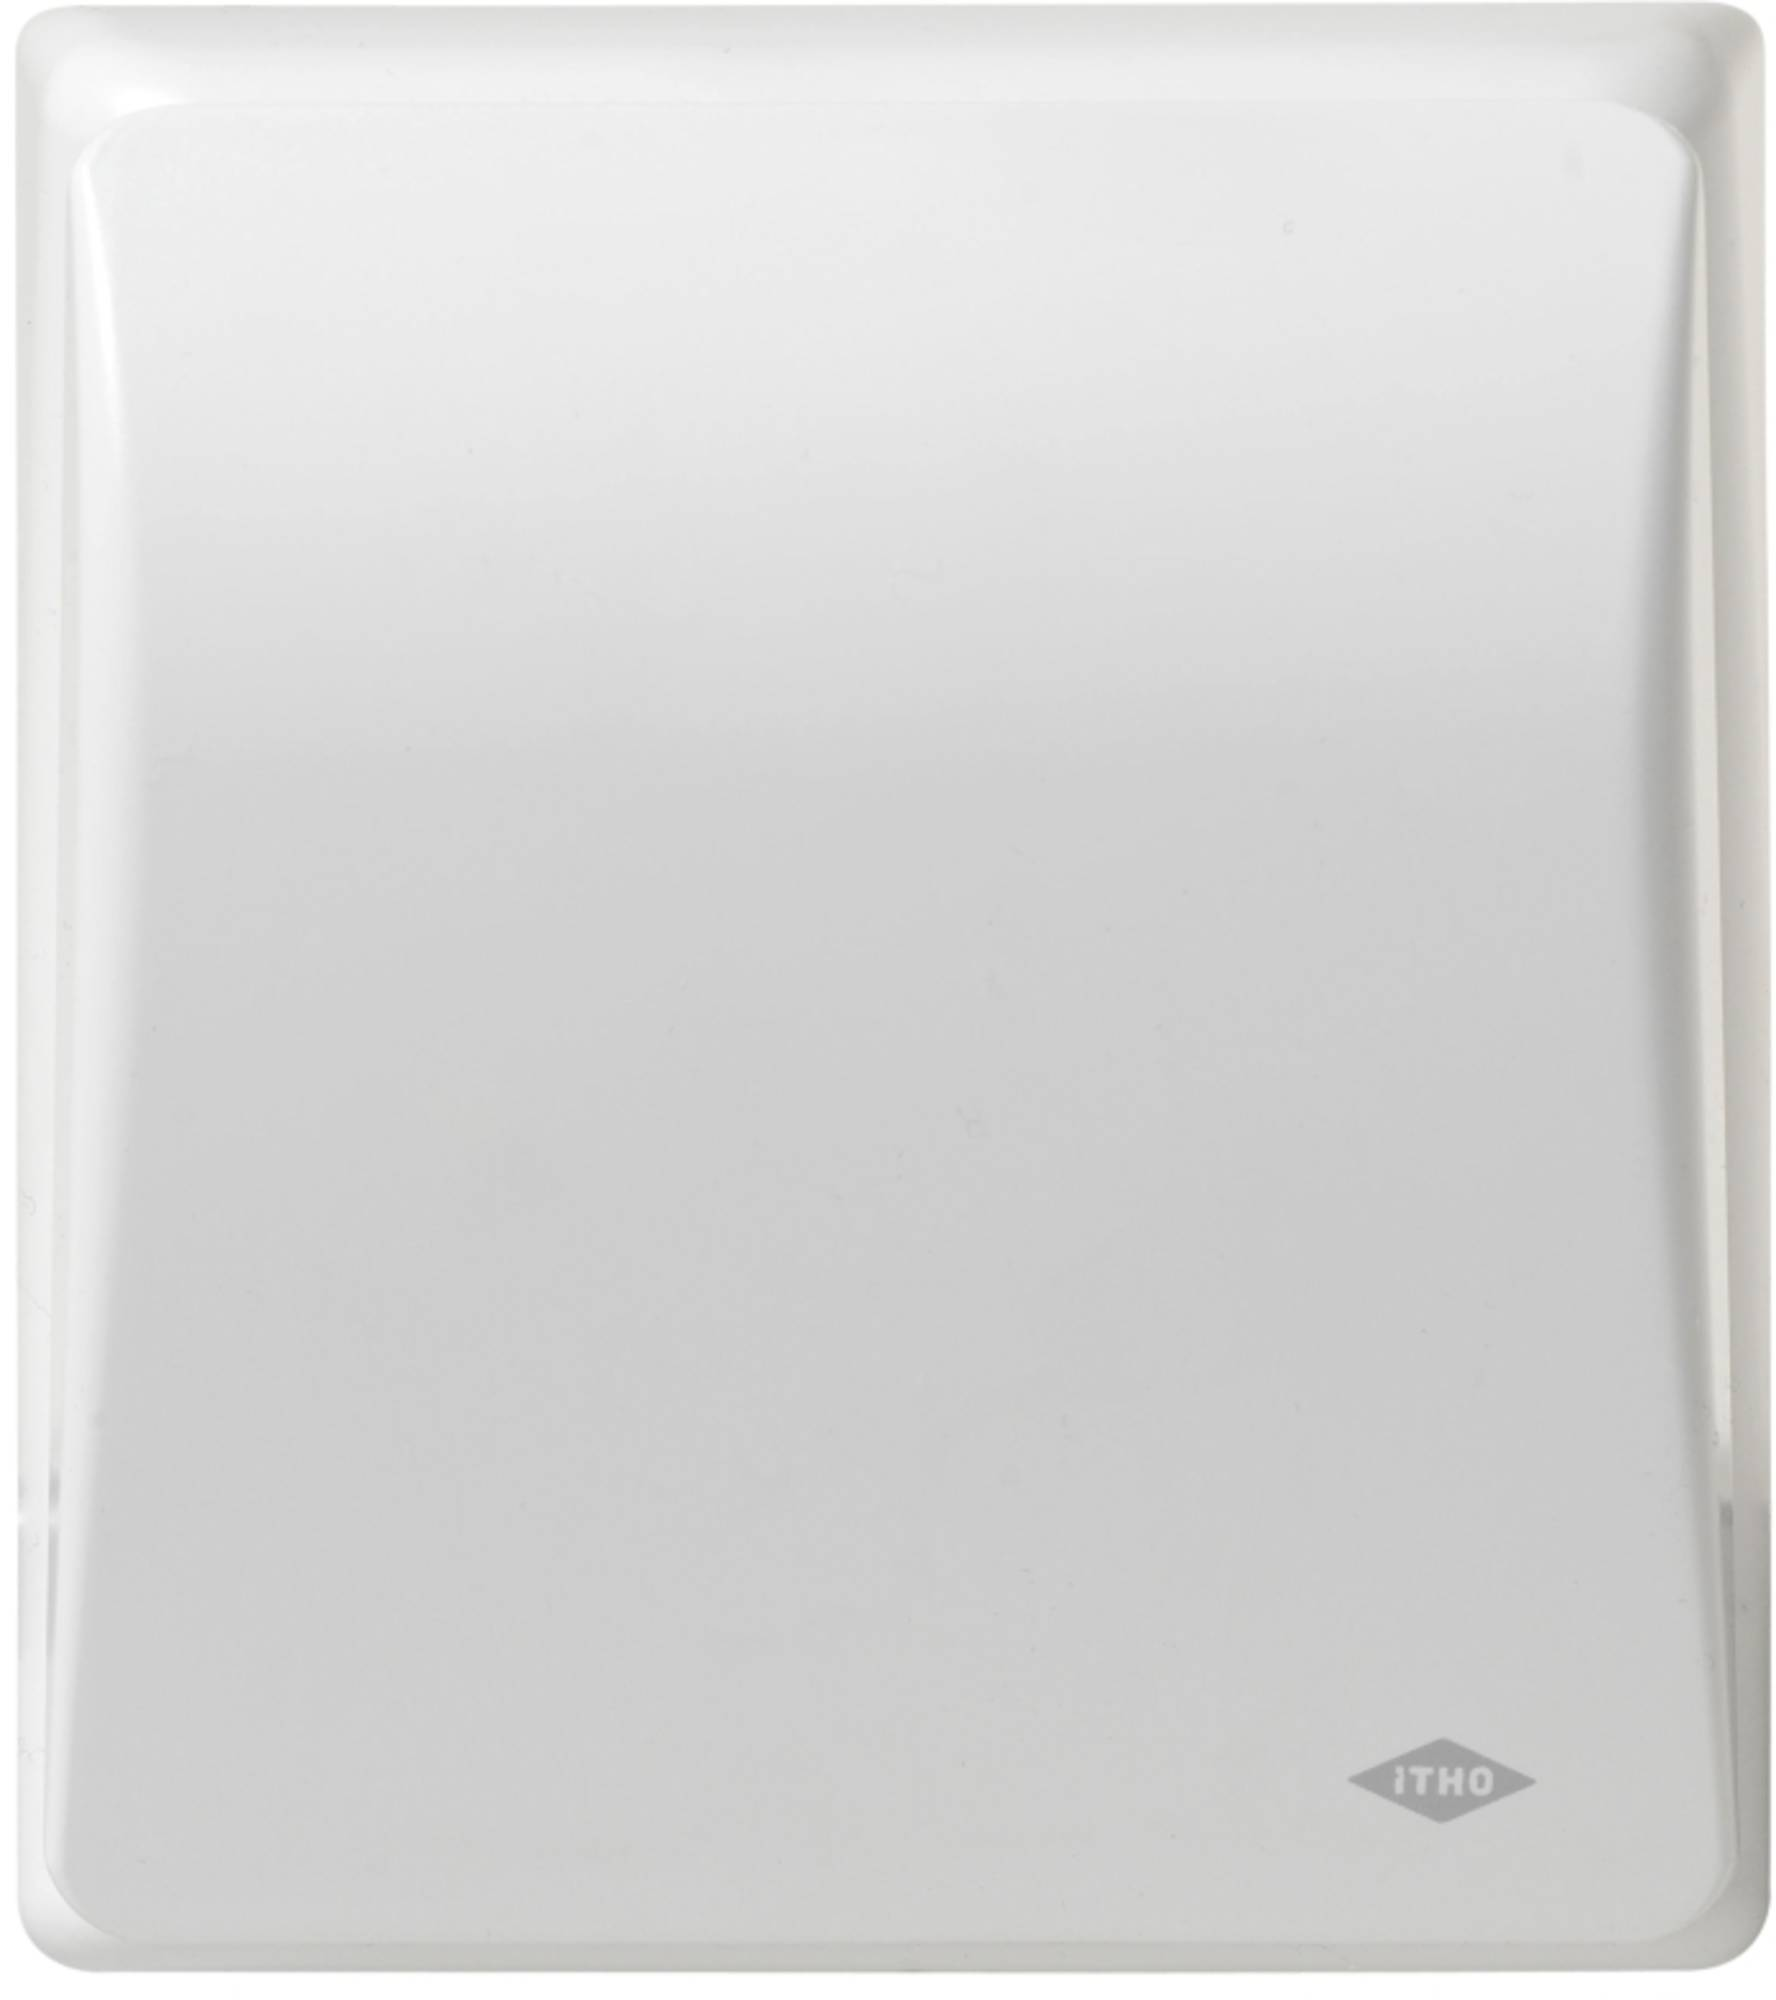 ITHO kanaalventilator 230v met timer WIT (5400911N)